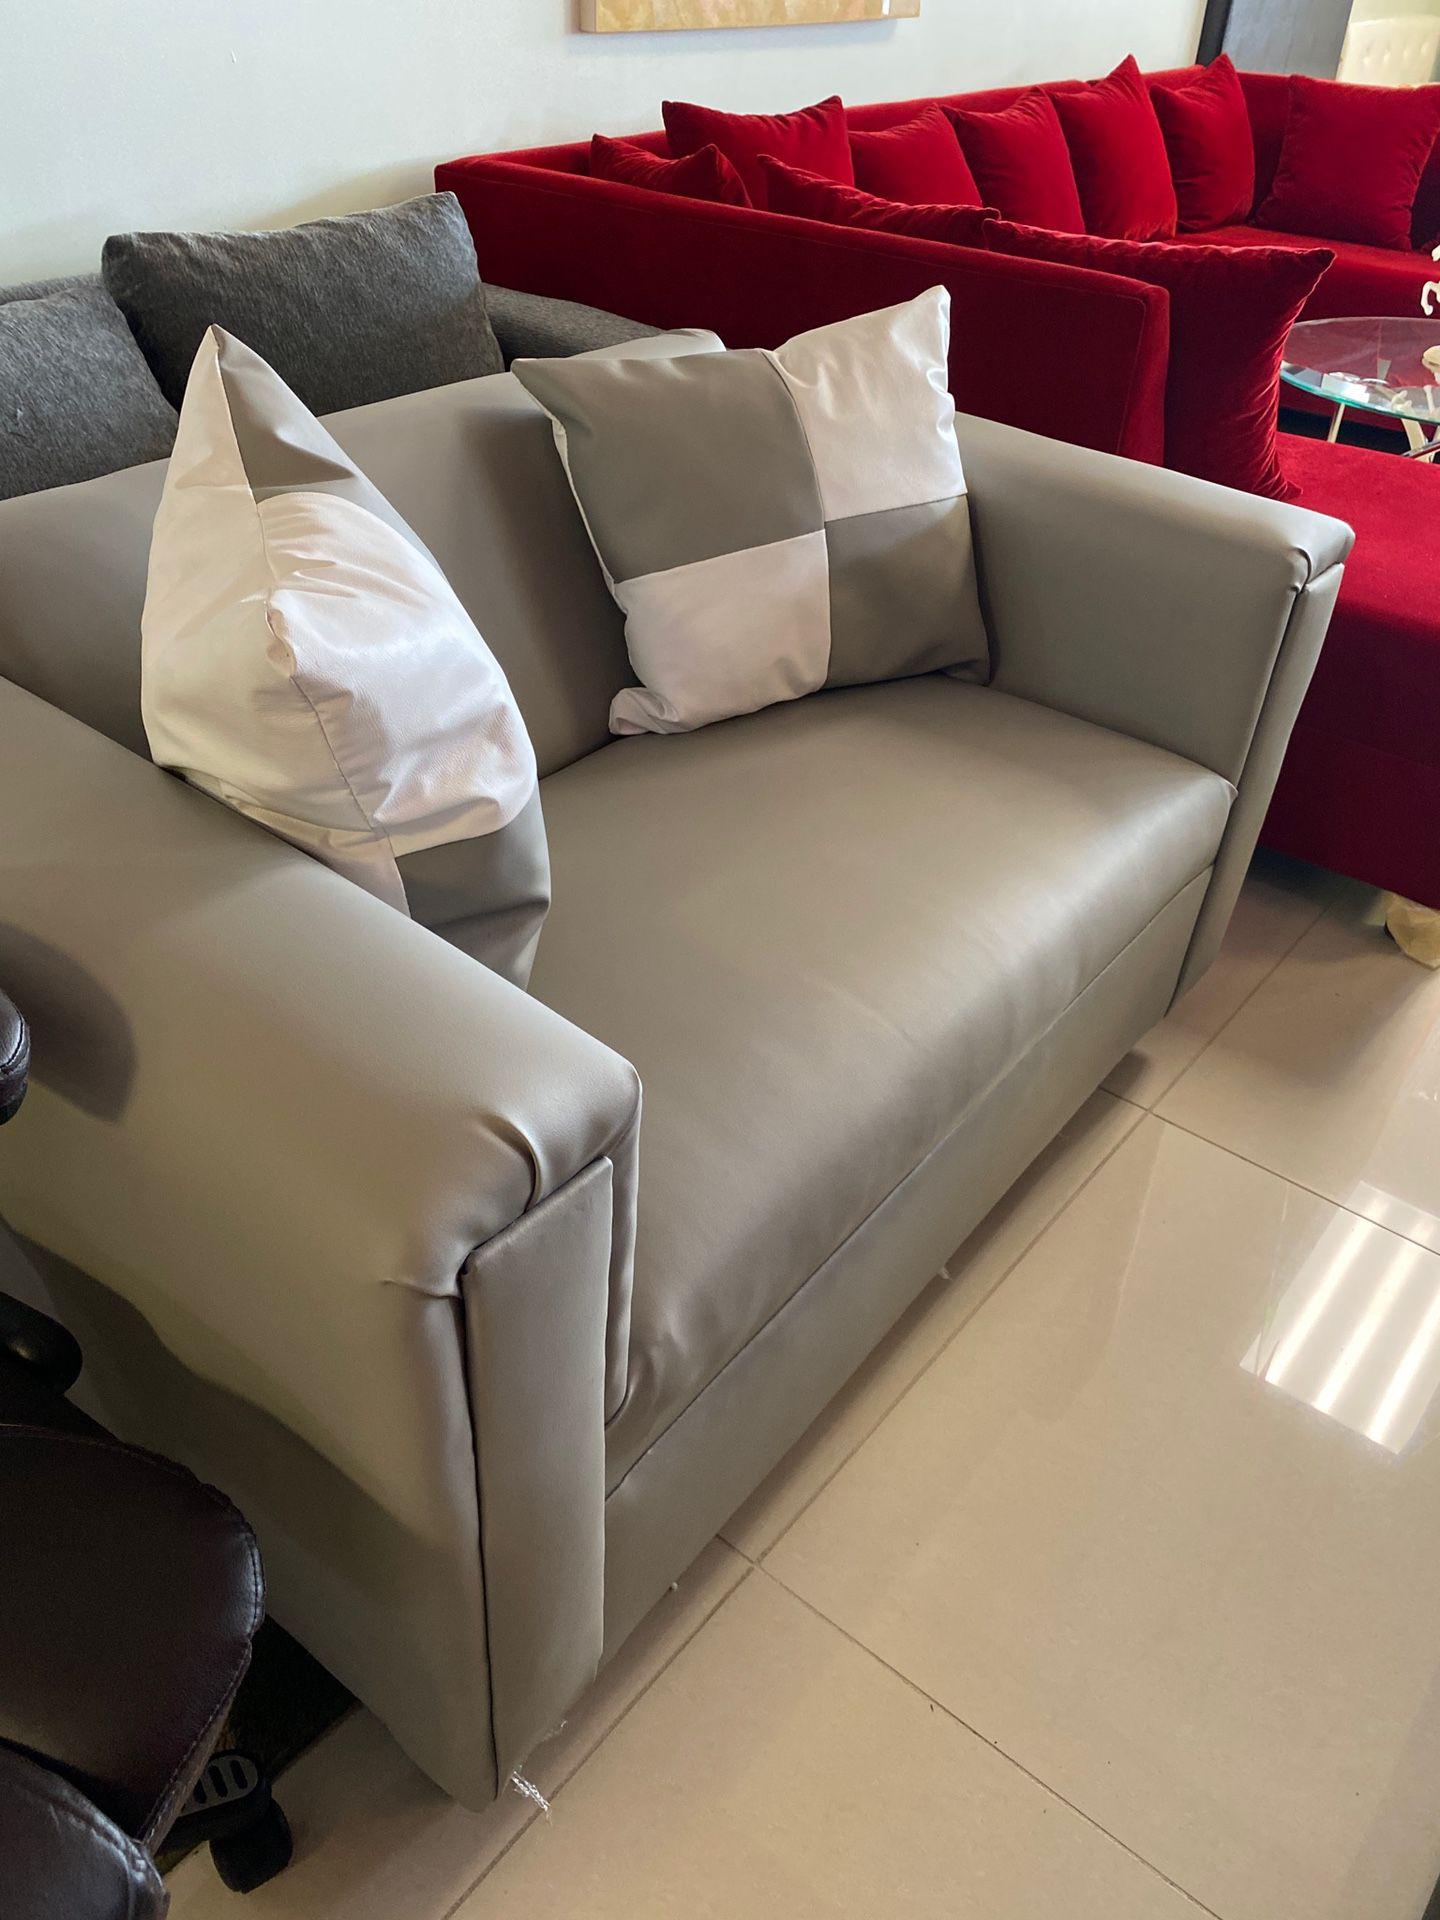 Sofa and love seat 2 PCS